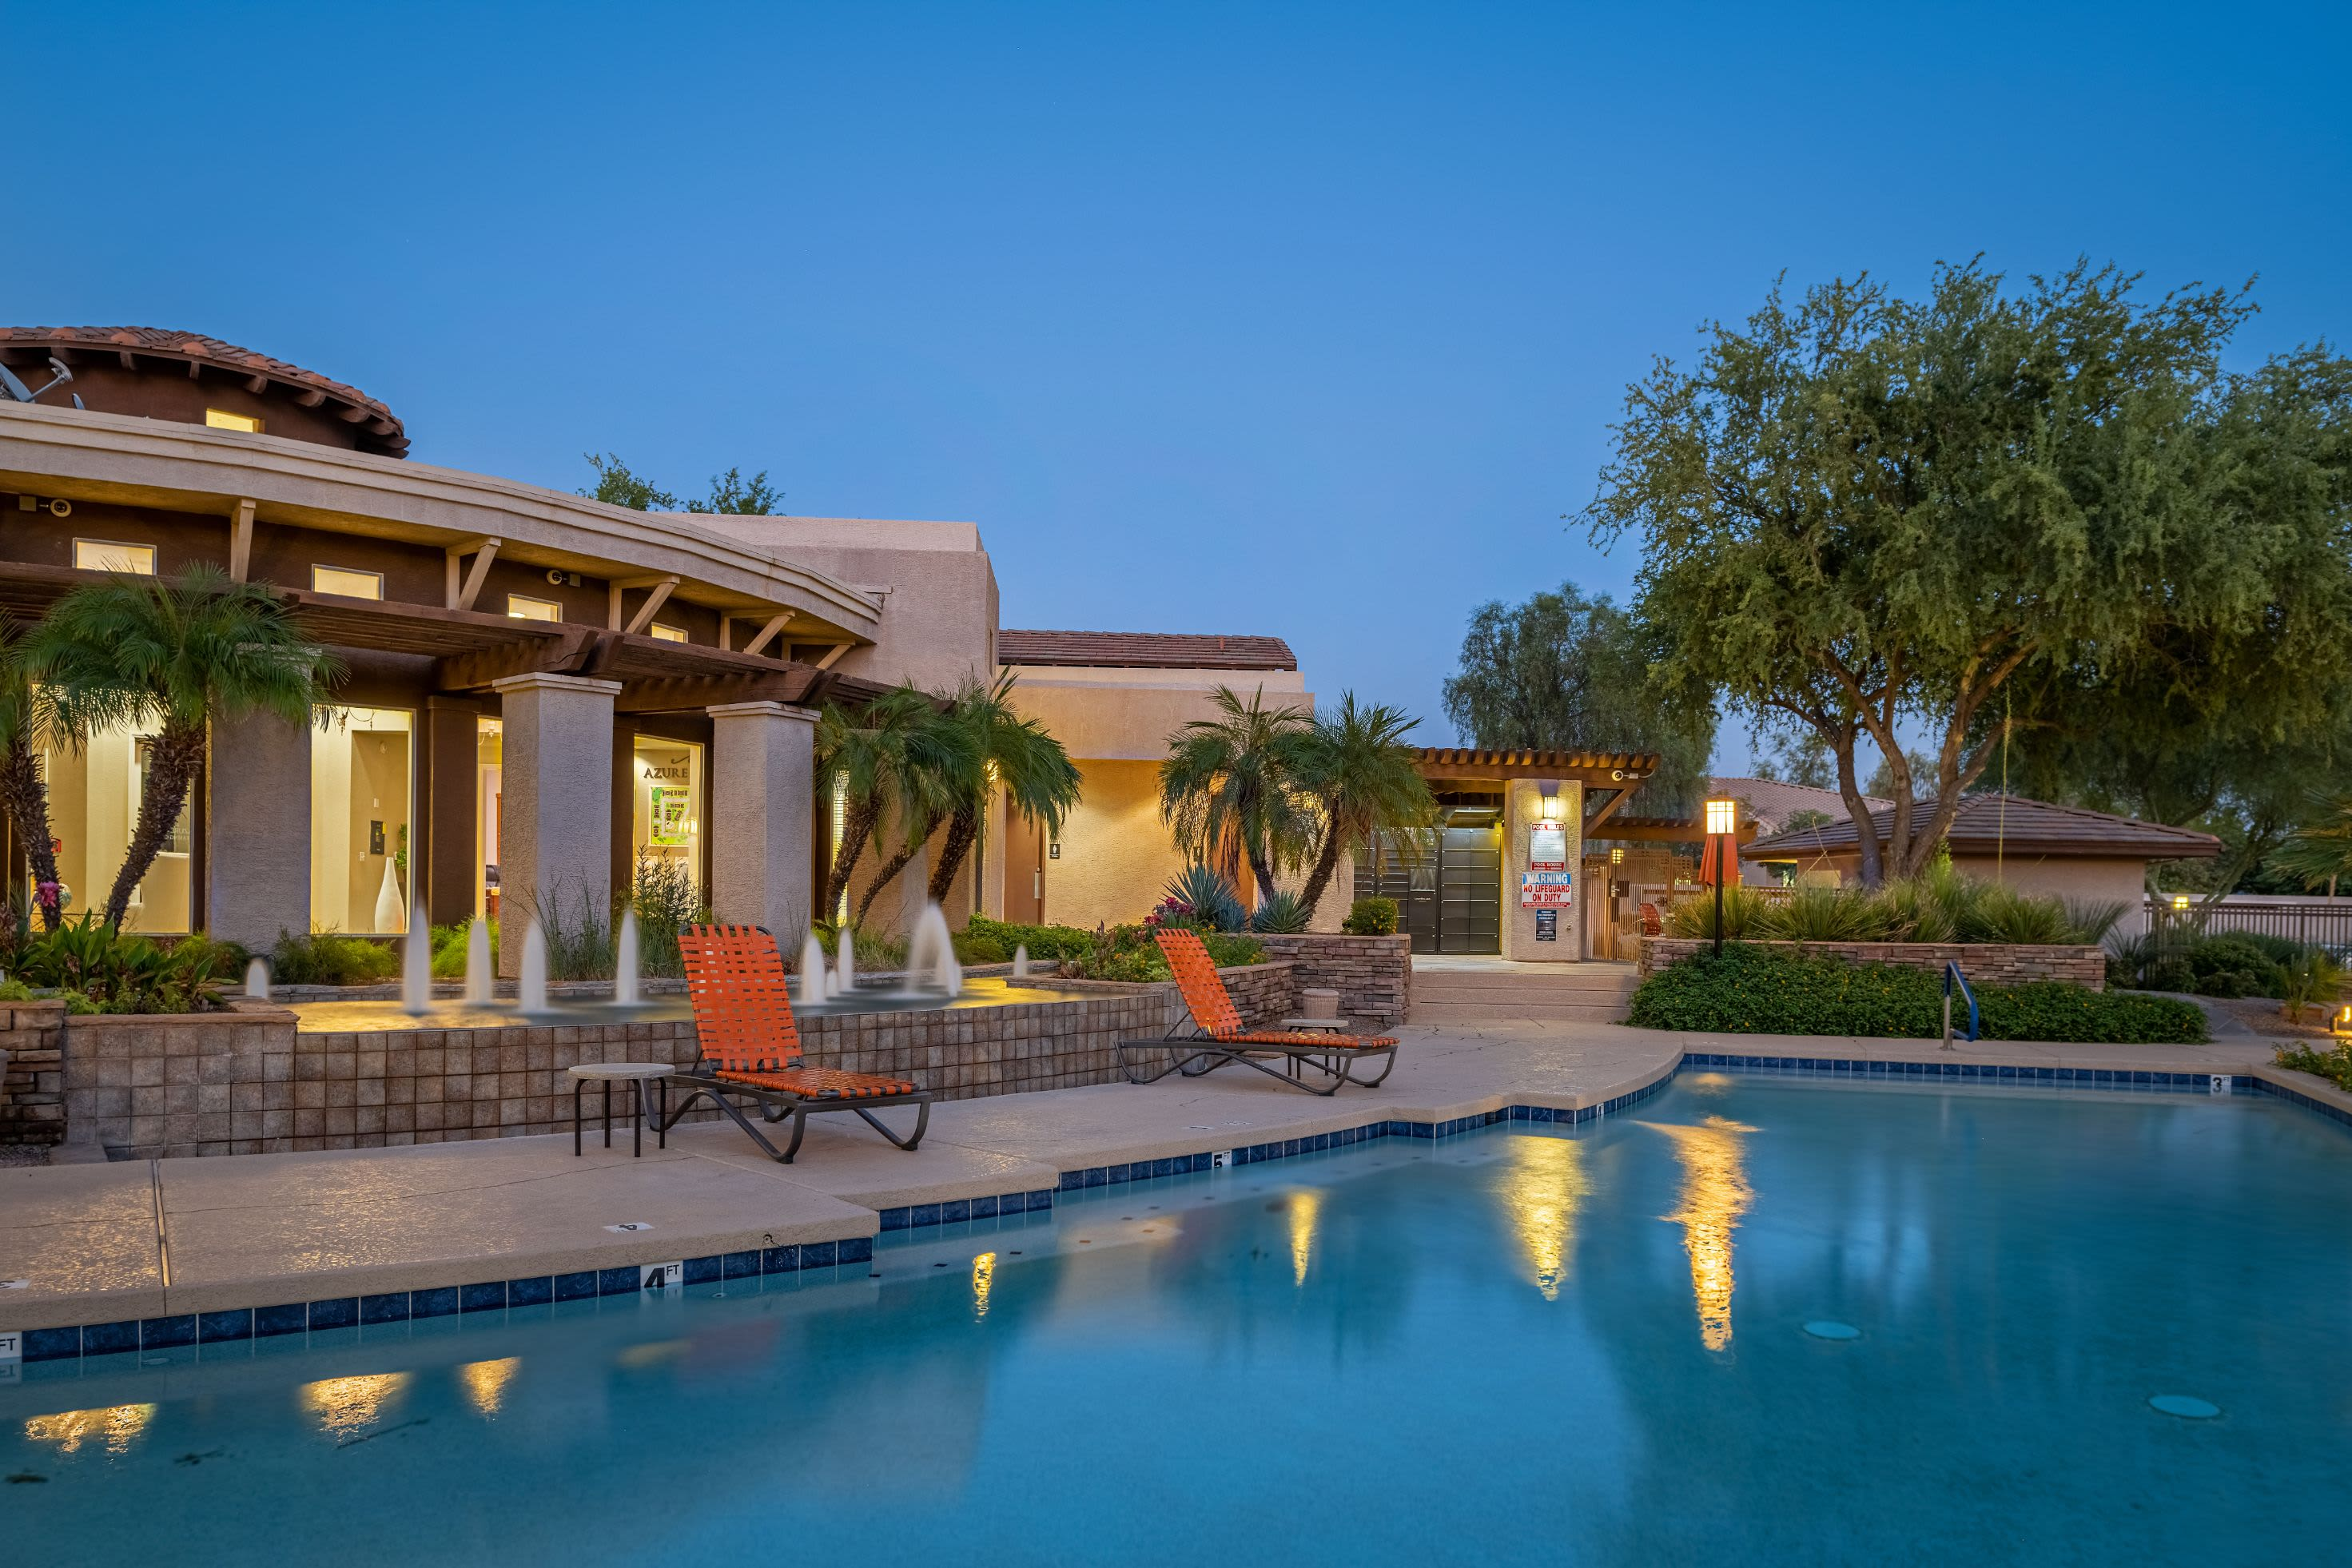 Resort-style pool with sun chairs at Azure Creek in Cave Creek, Arizona